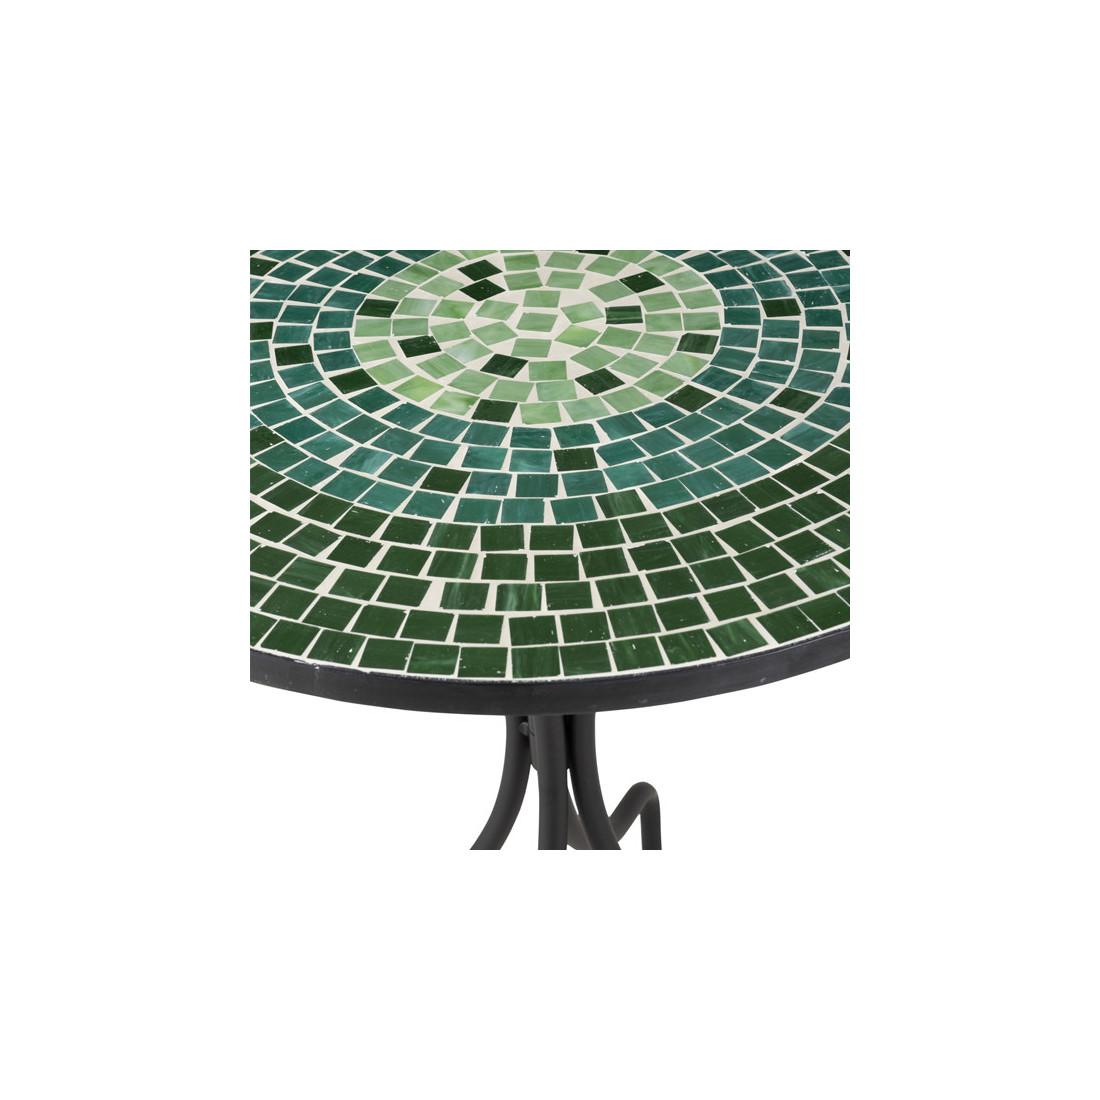 table ronde m tal mosa que verte newia n 1 univers du jardin. Black Bedroom Furniture Sets. Home Design Ideas